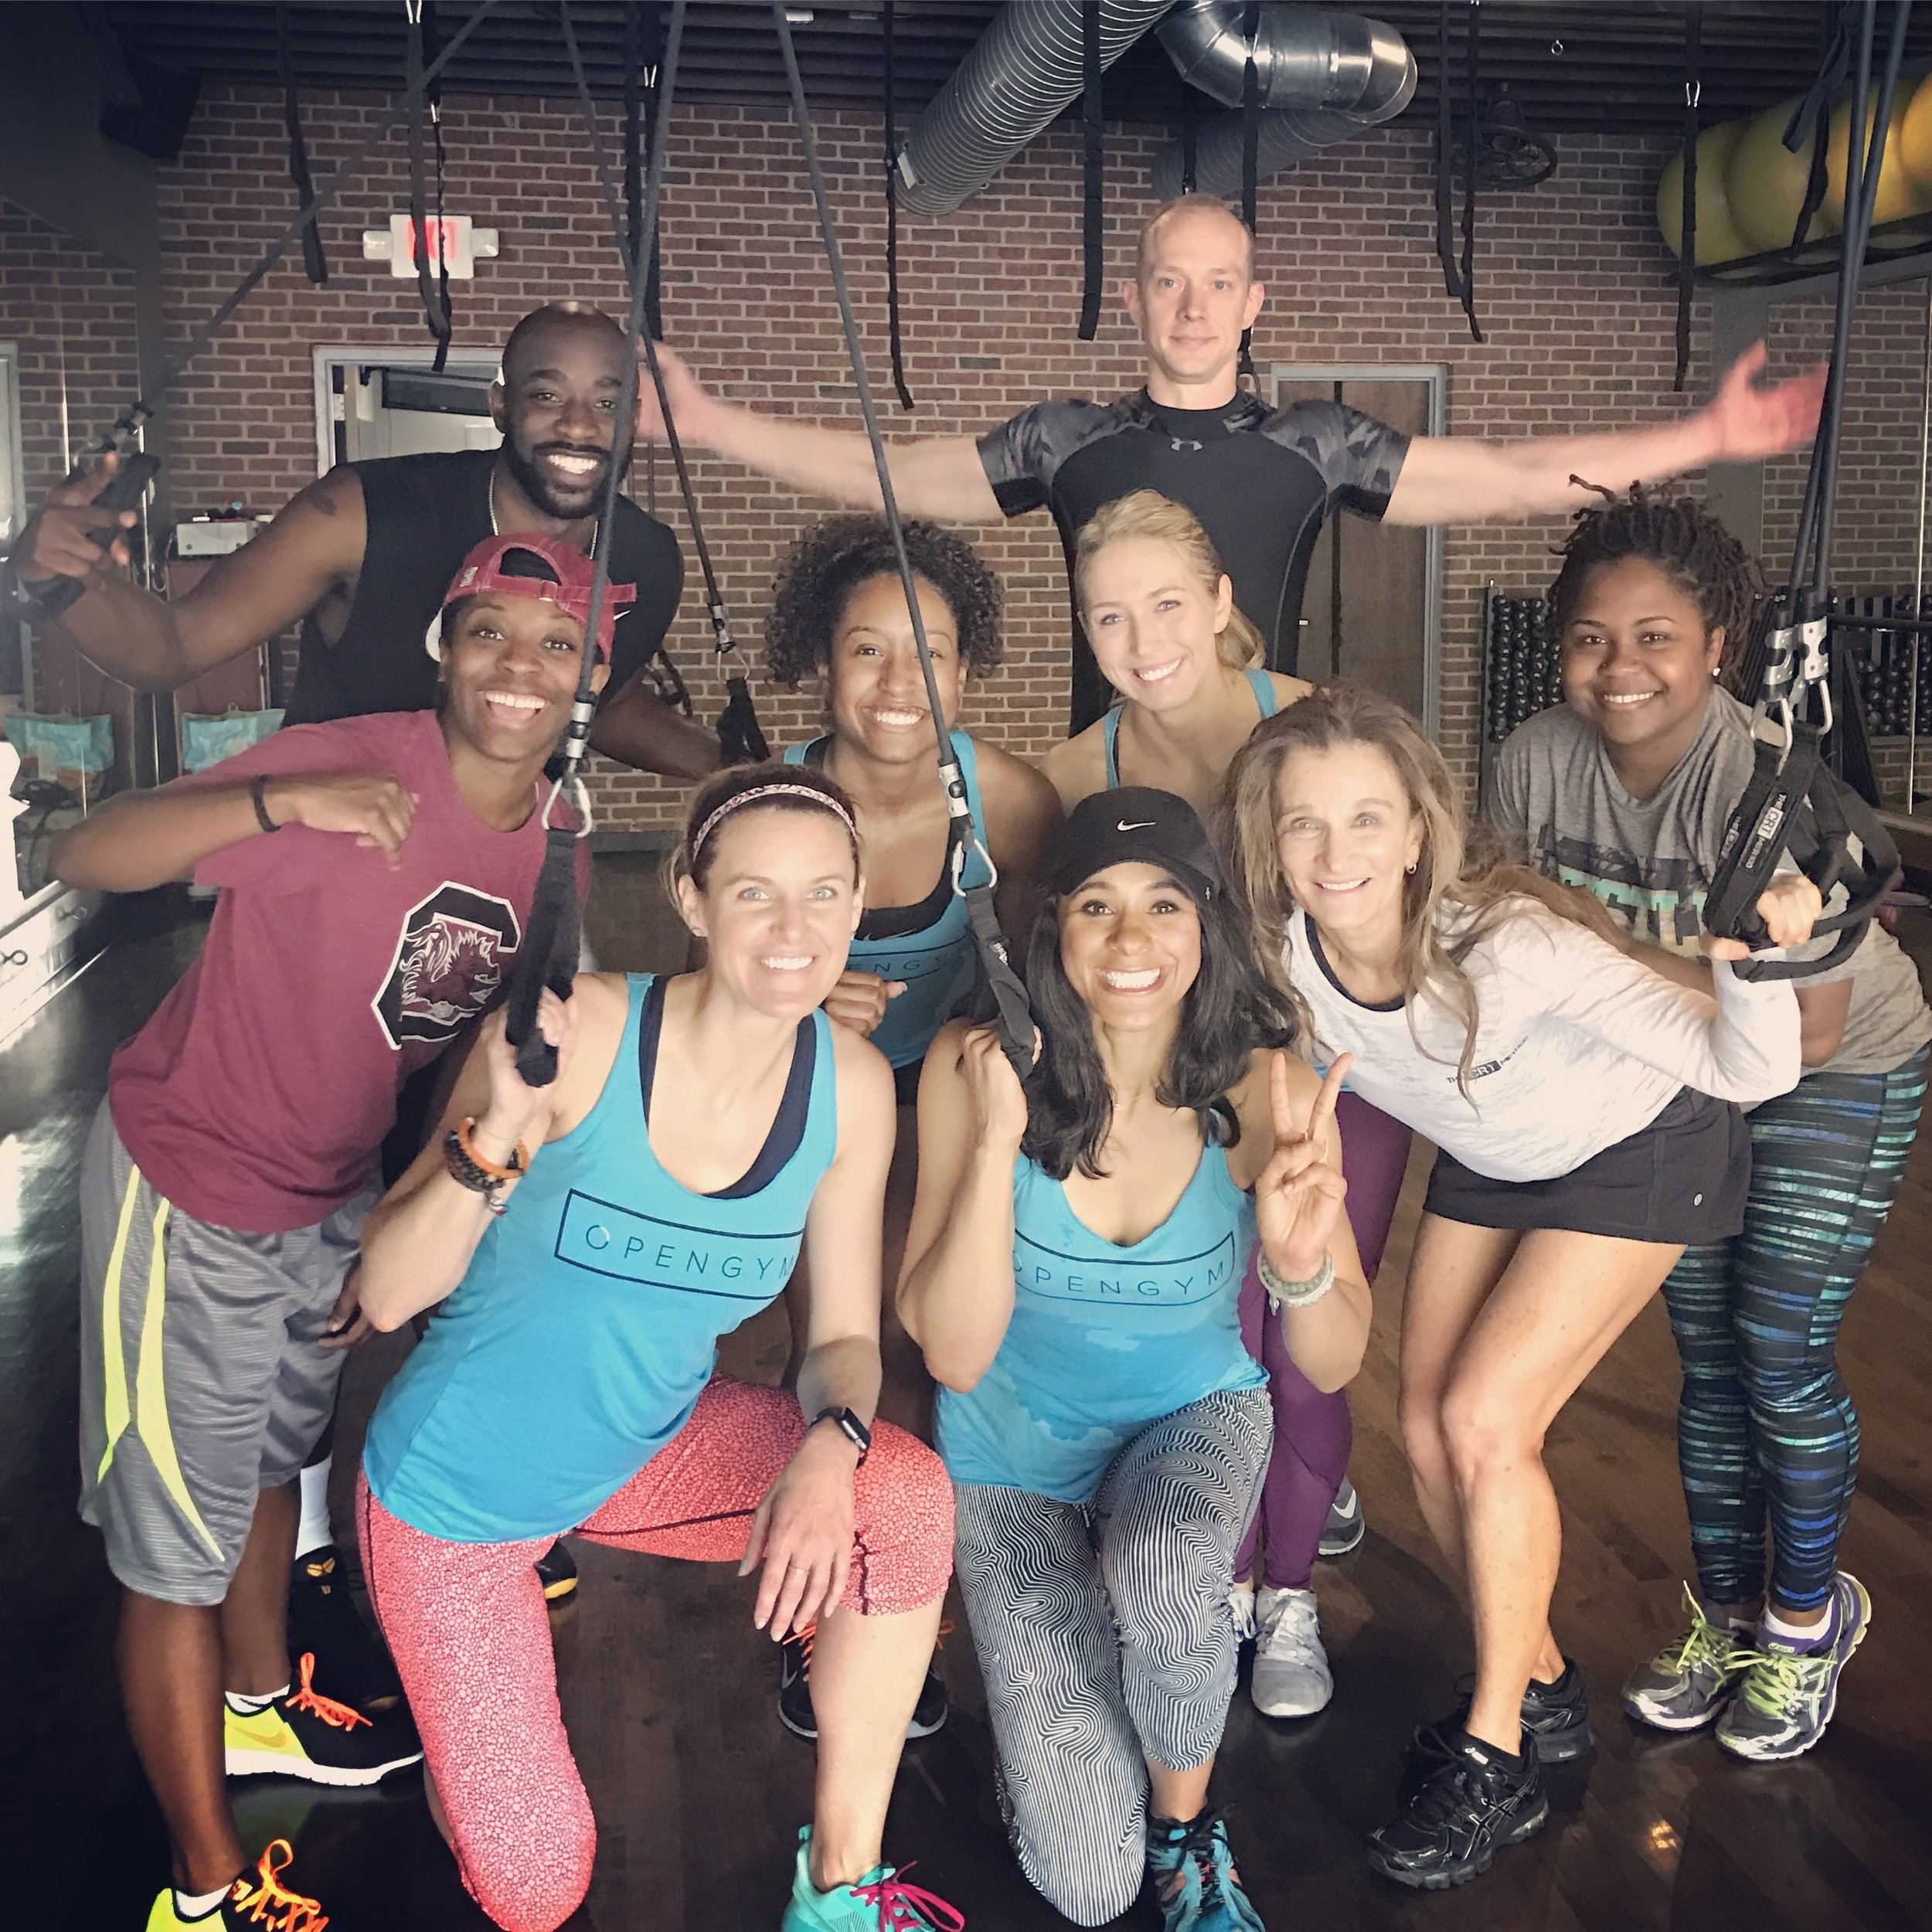 Open Gym Members